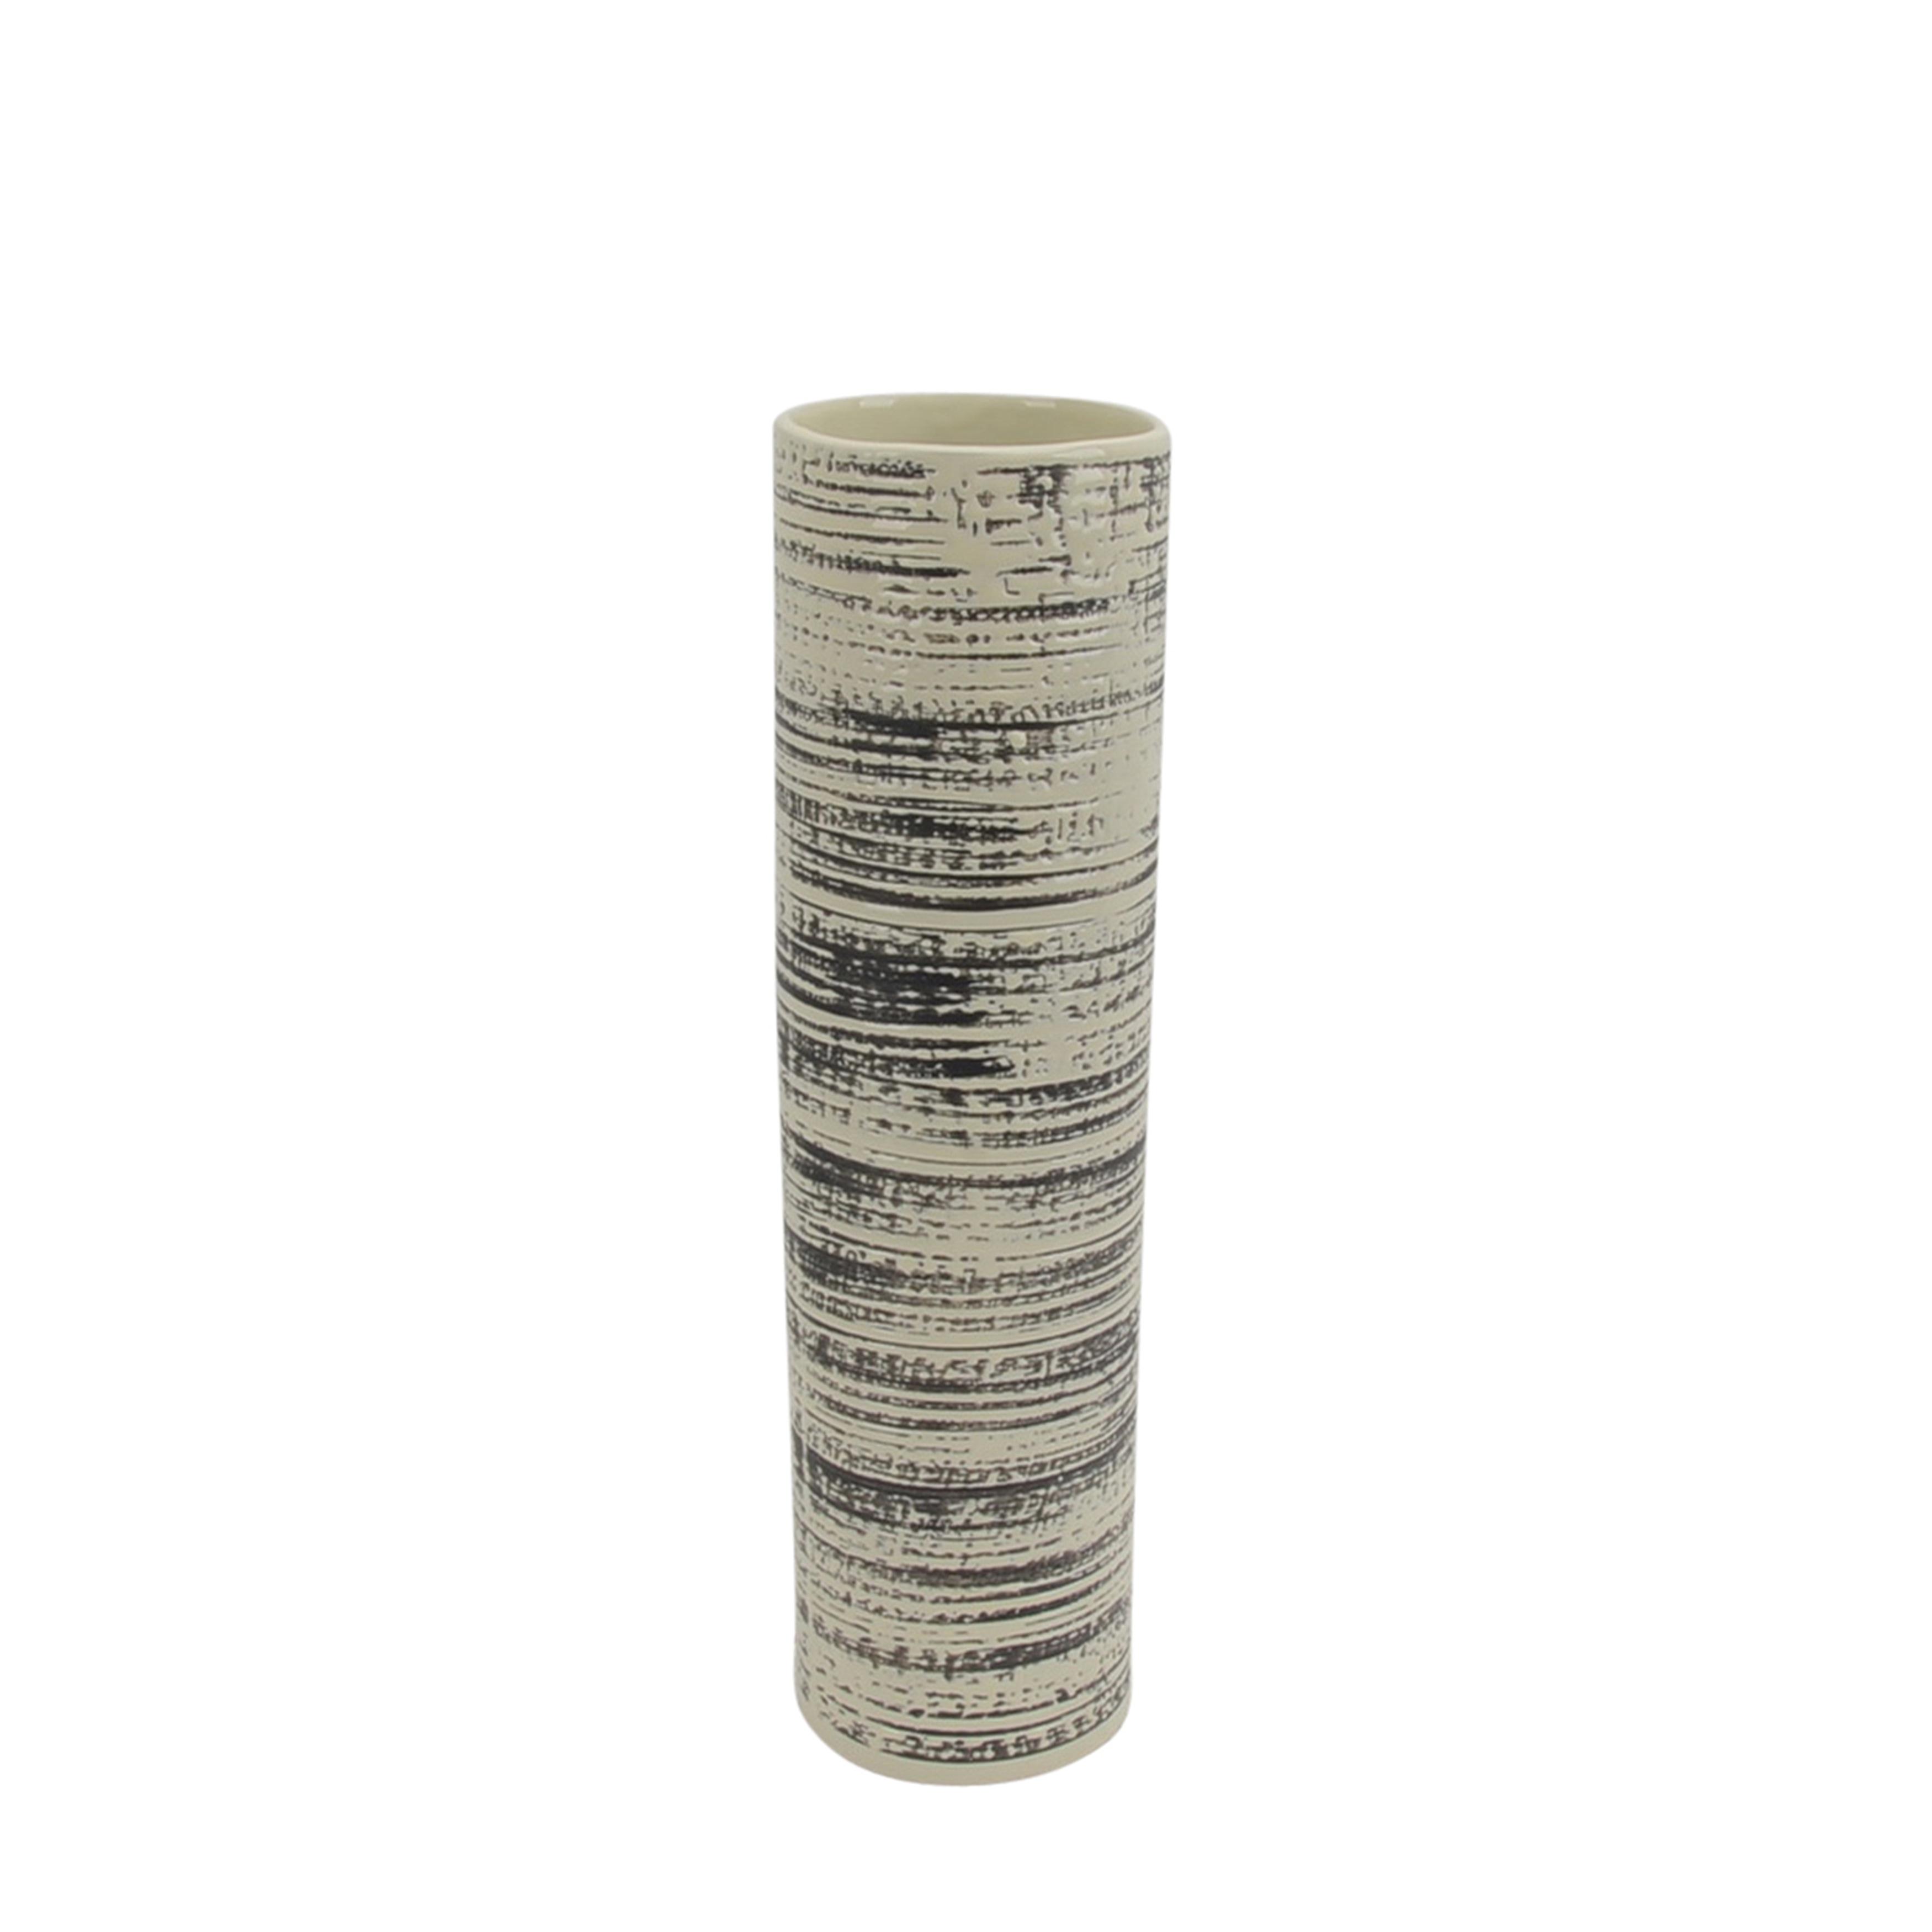 Transitional Ceramic Vase with Cylindrical Shape, Black and White